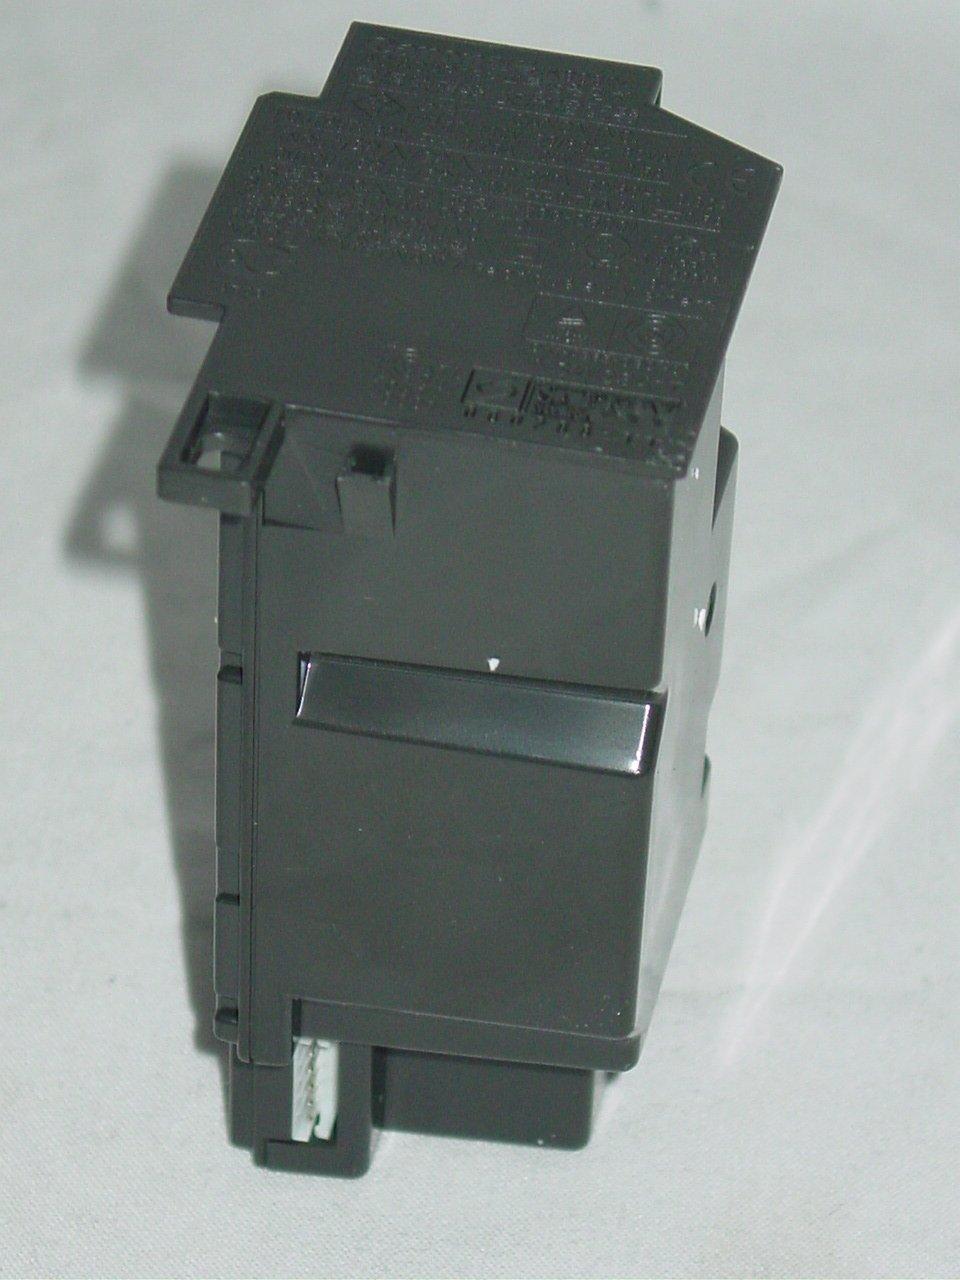 Canon K30304 AC Power Adapter PIXMA MP620B IP3600 IP4700 MP620 MP640 IP4600 Printer